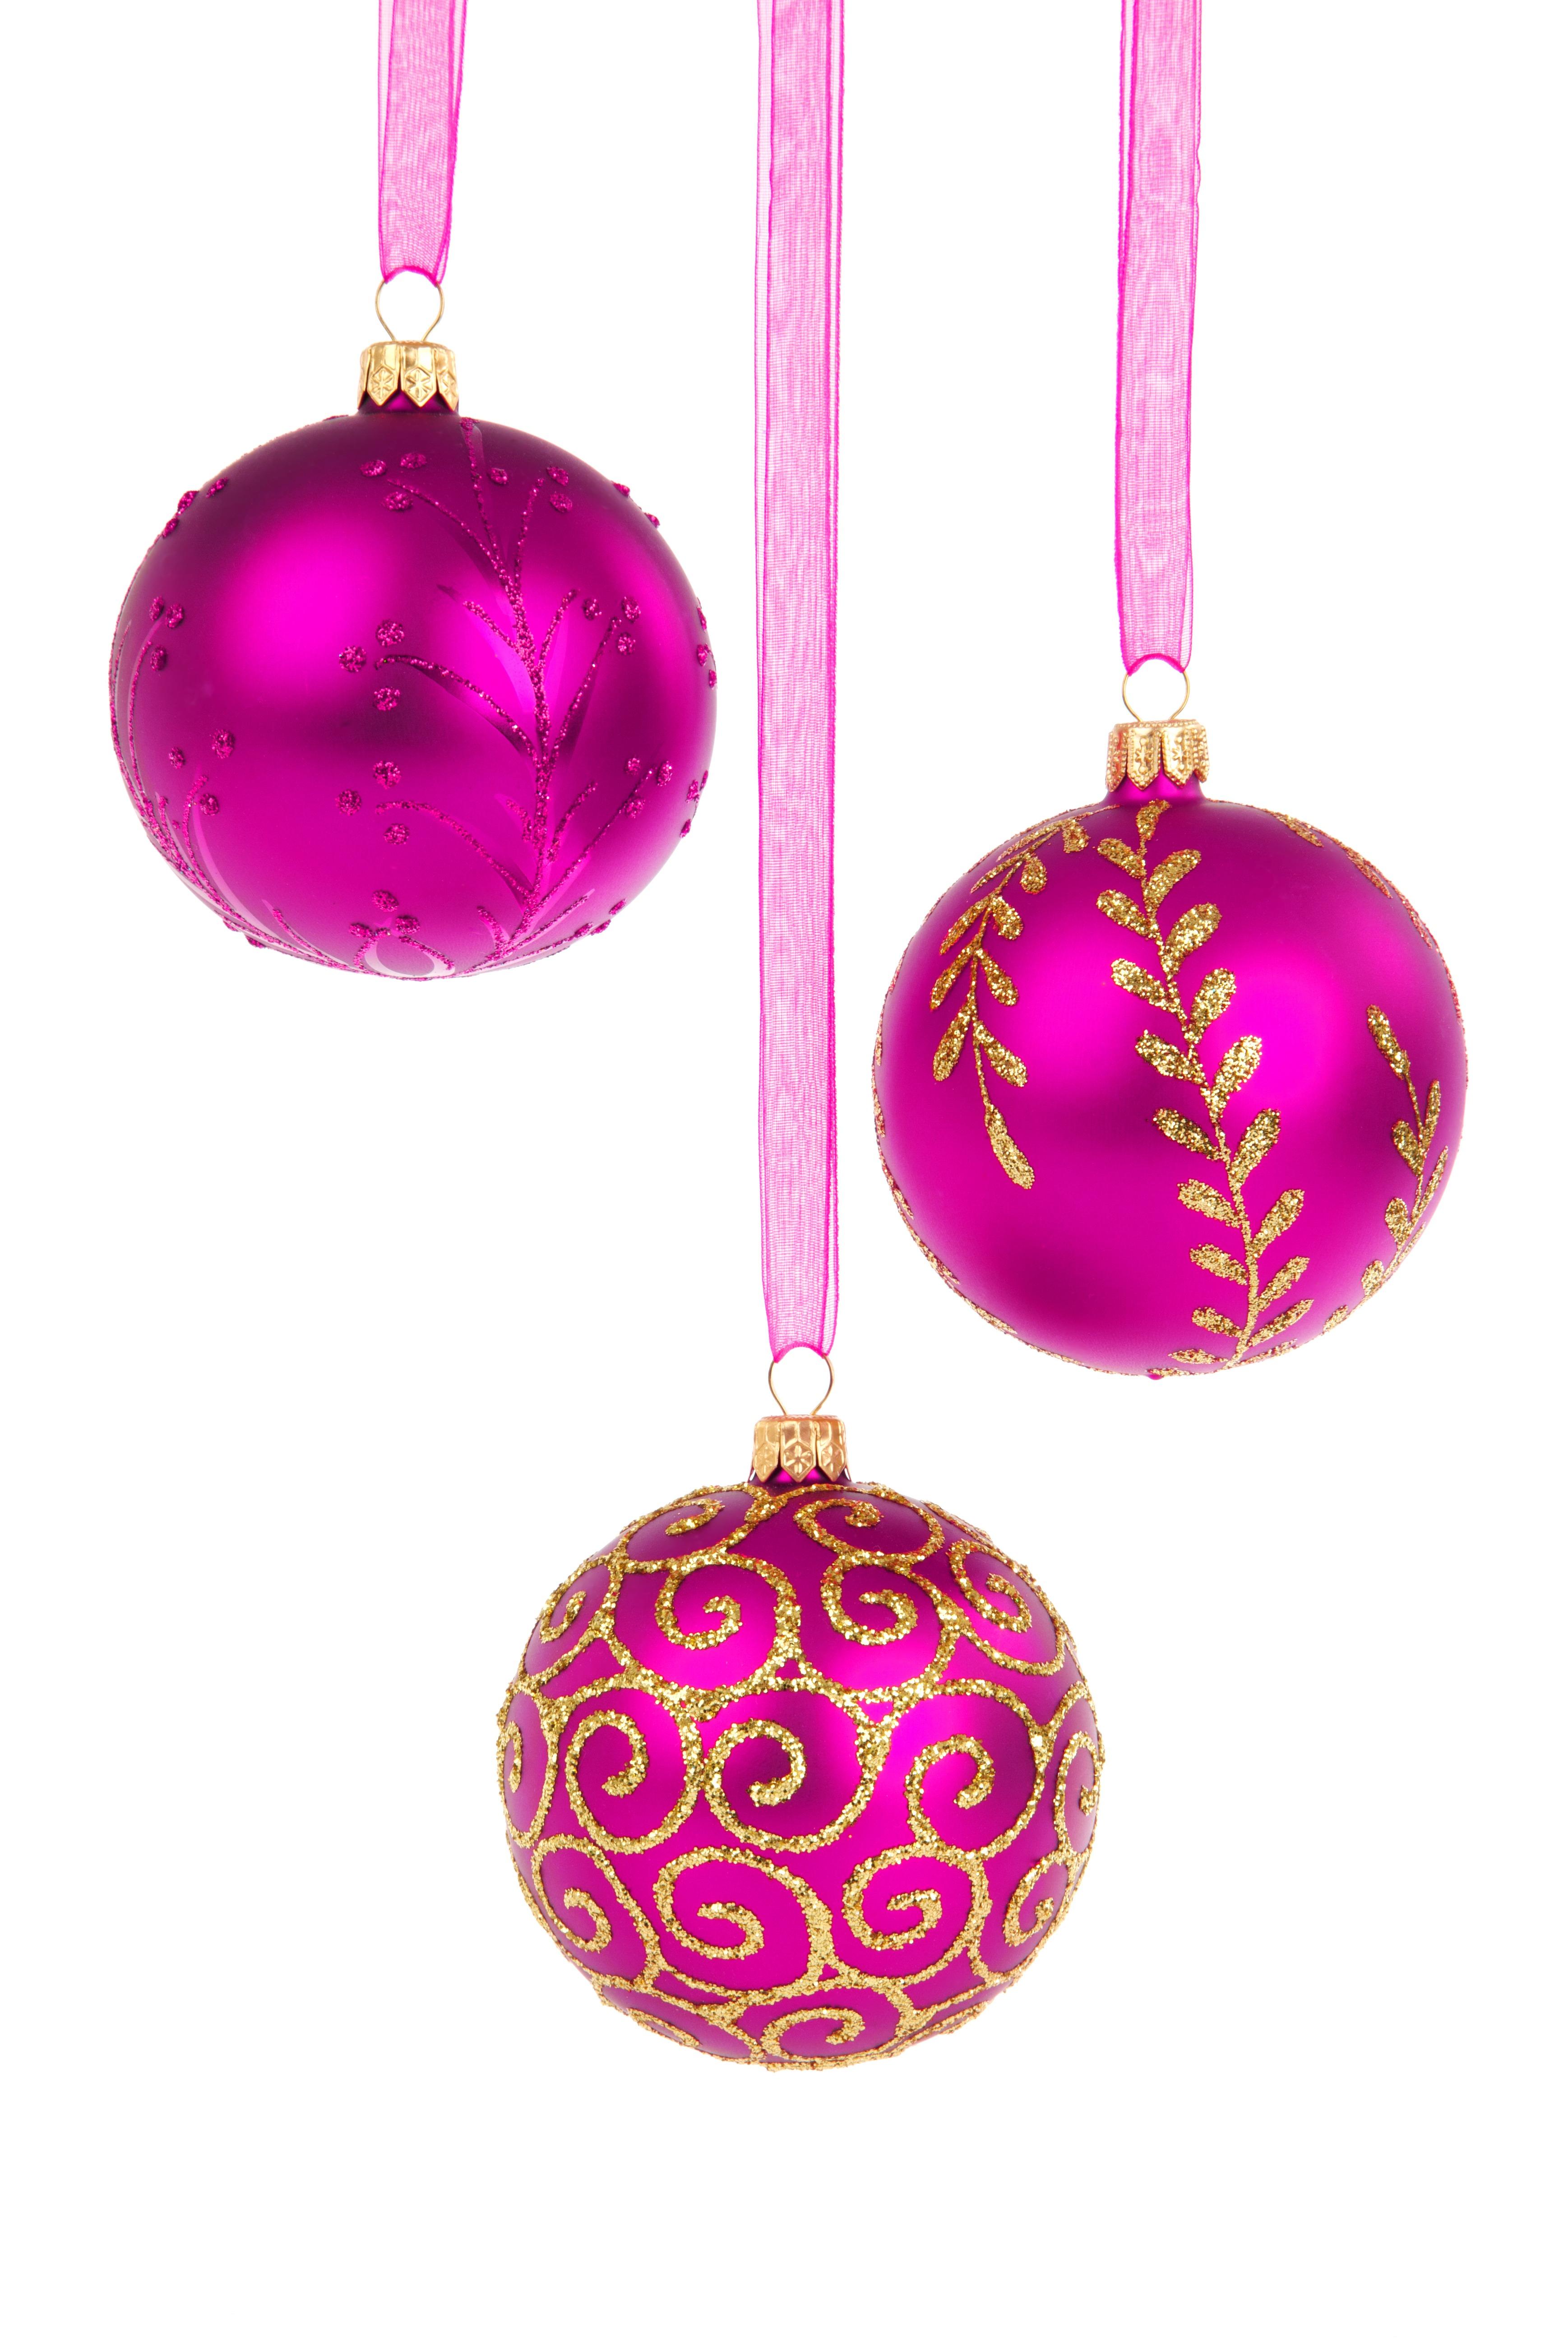 Holiday Hanging Object Pink Decor Circle Bauble Ornament Christmas Decoration Jewellery Three Decorative Earrings Seasonal Ball Magenta